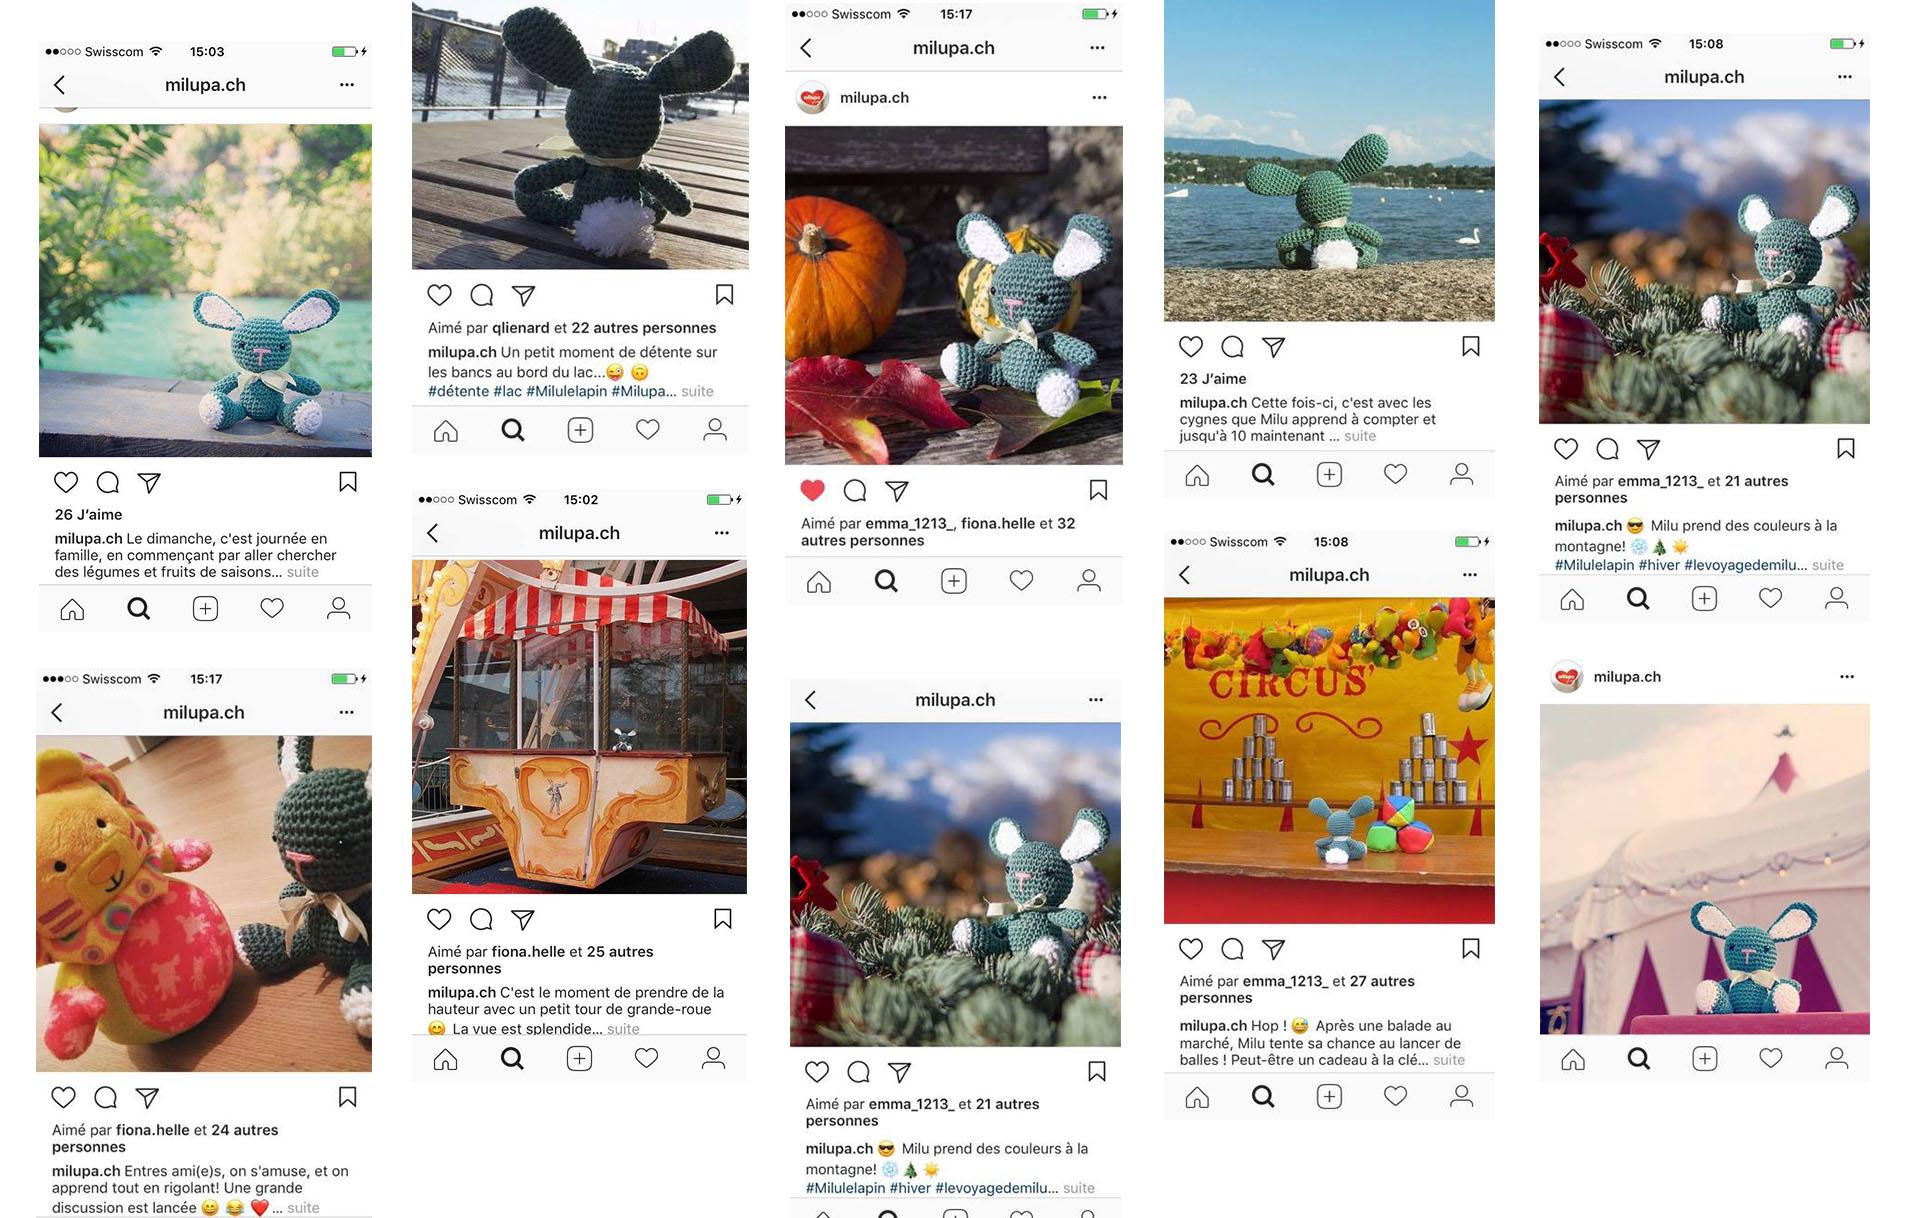 Instagram Posts Milupa